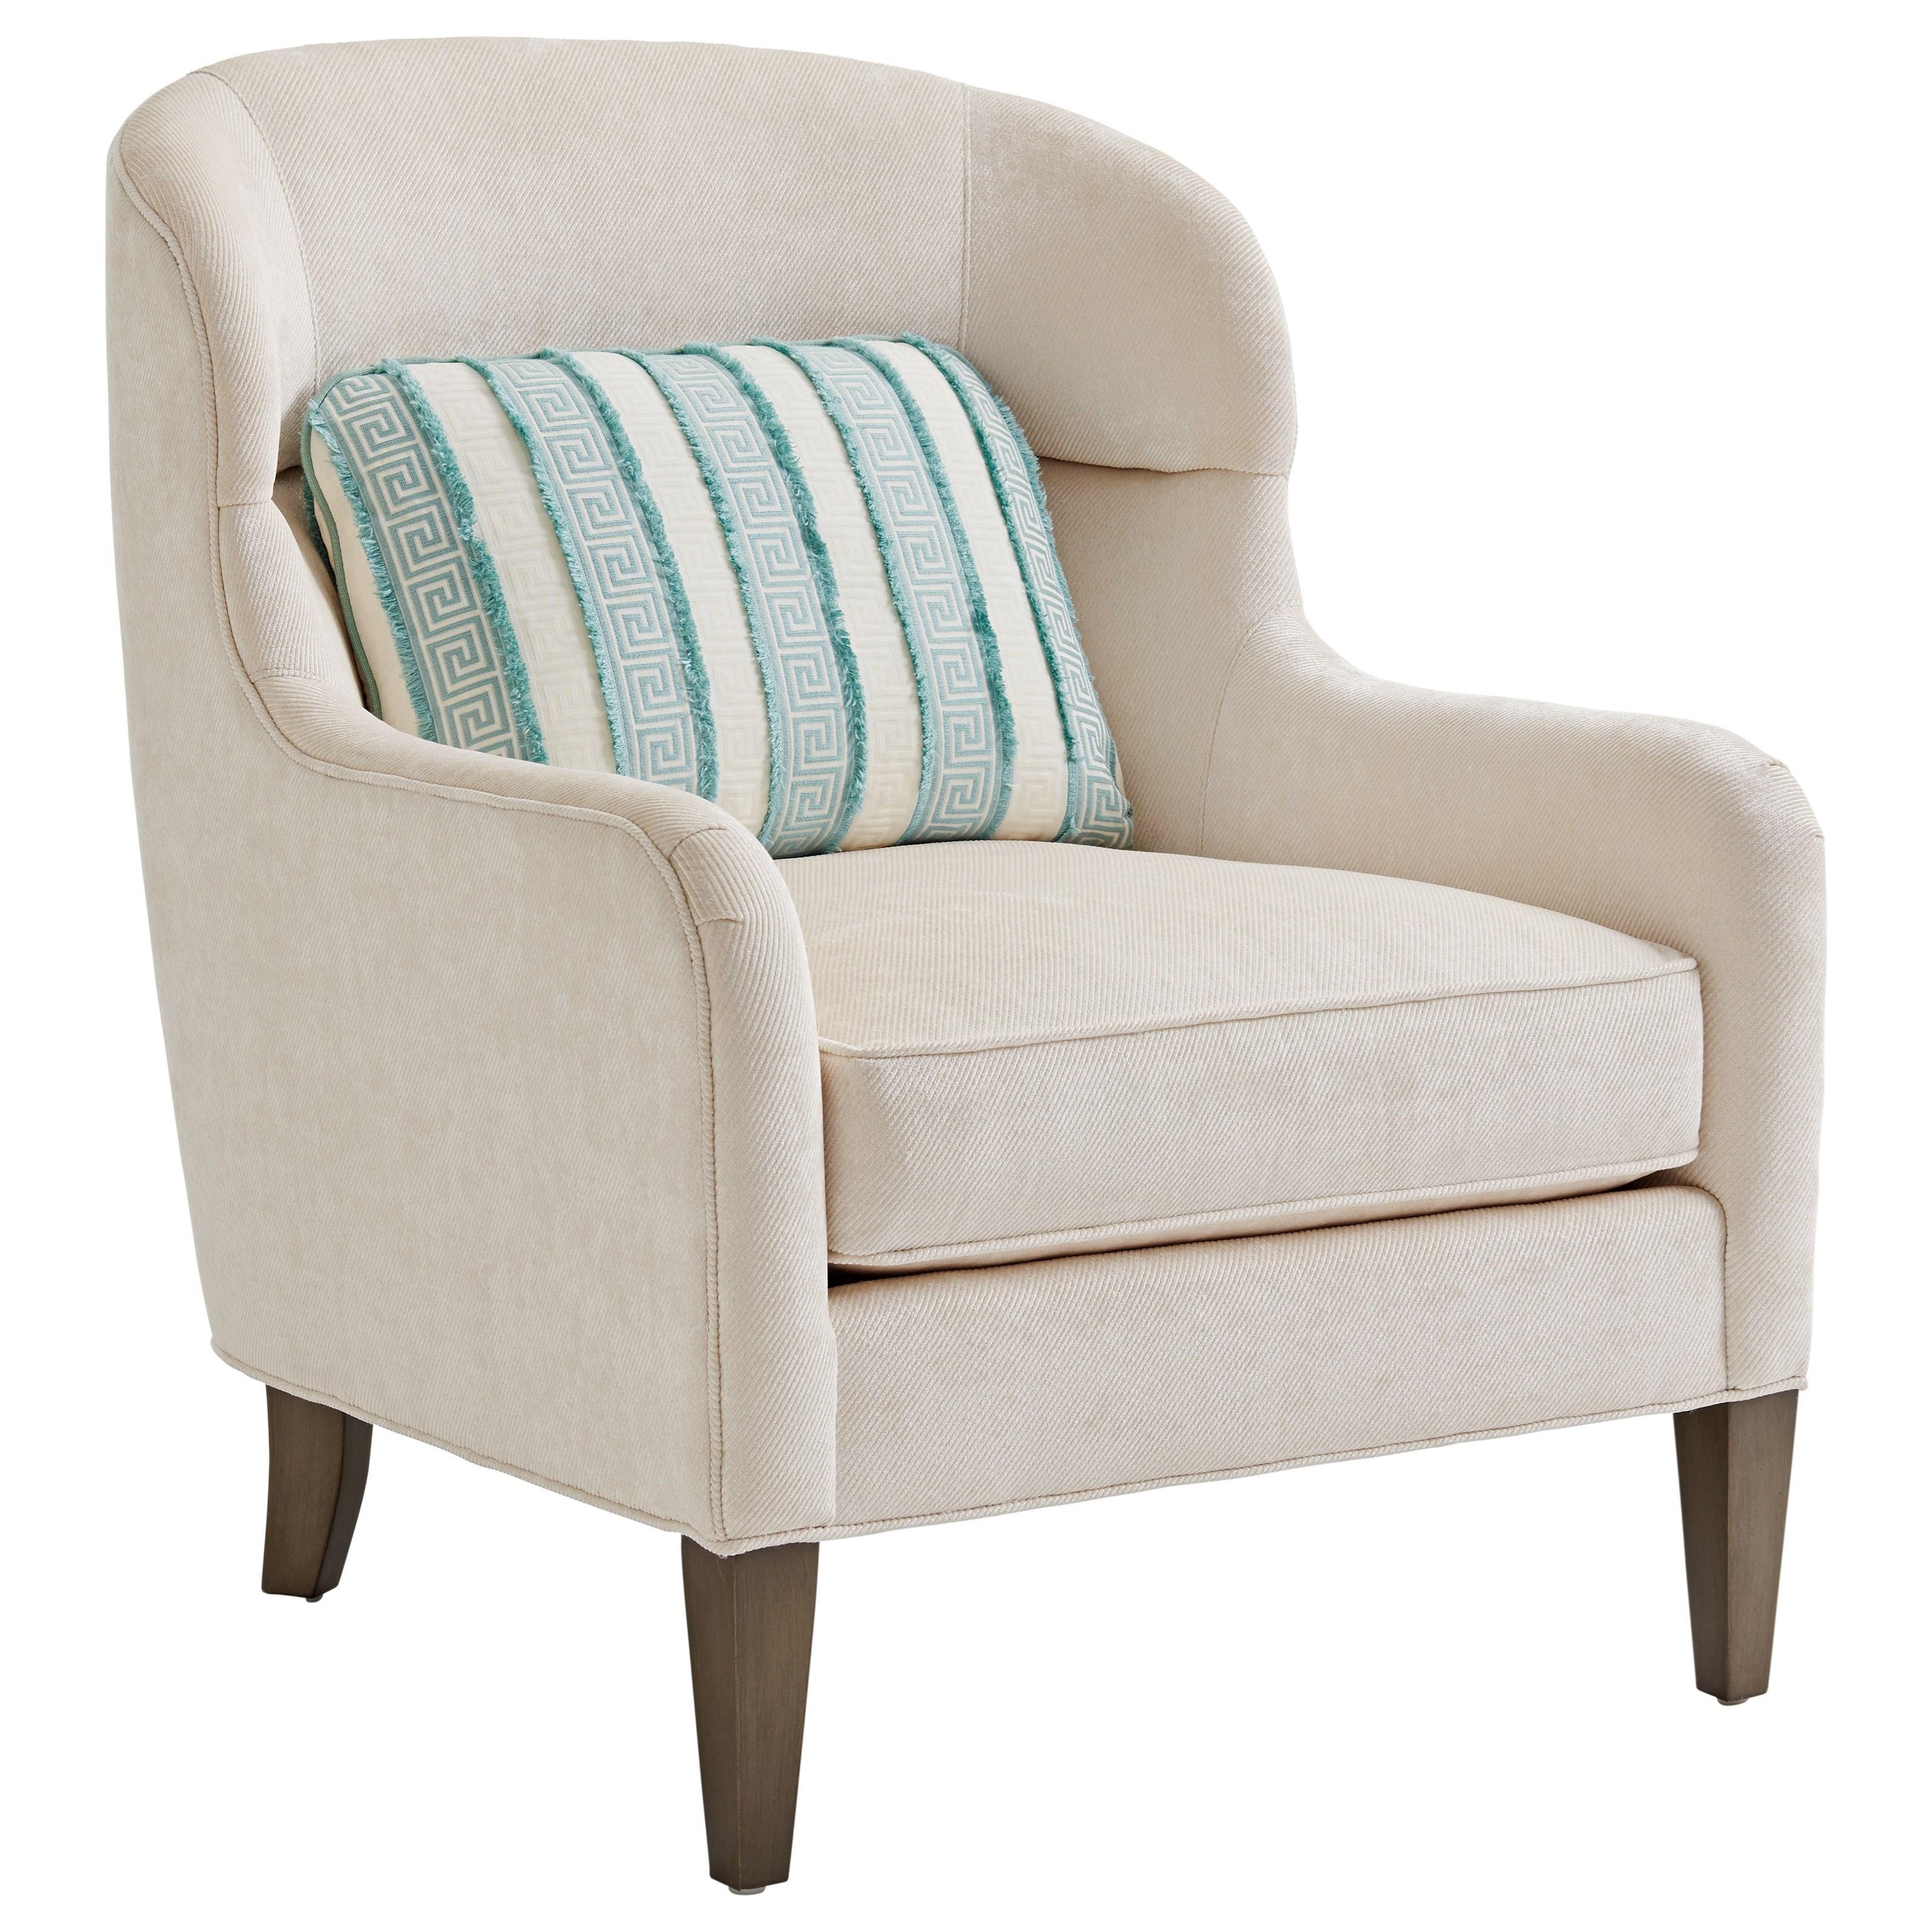 Ariana Chaffery Chair by Lexington at Baer's Furniture